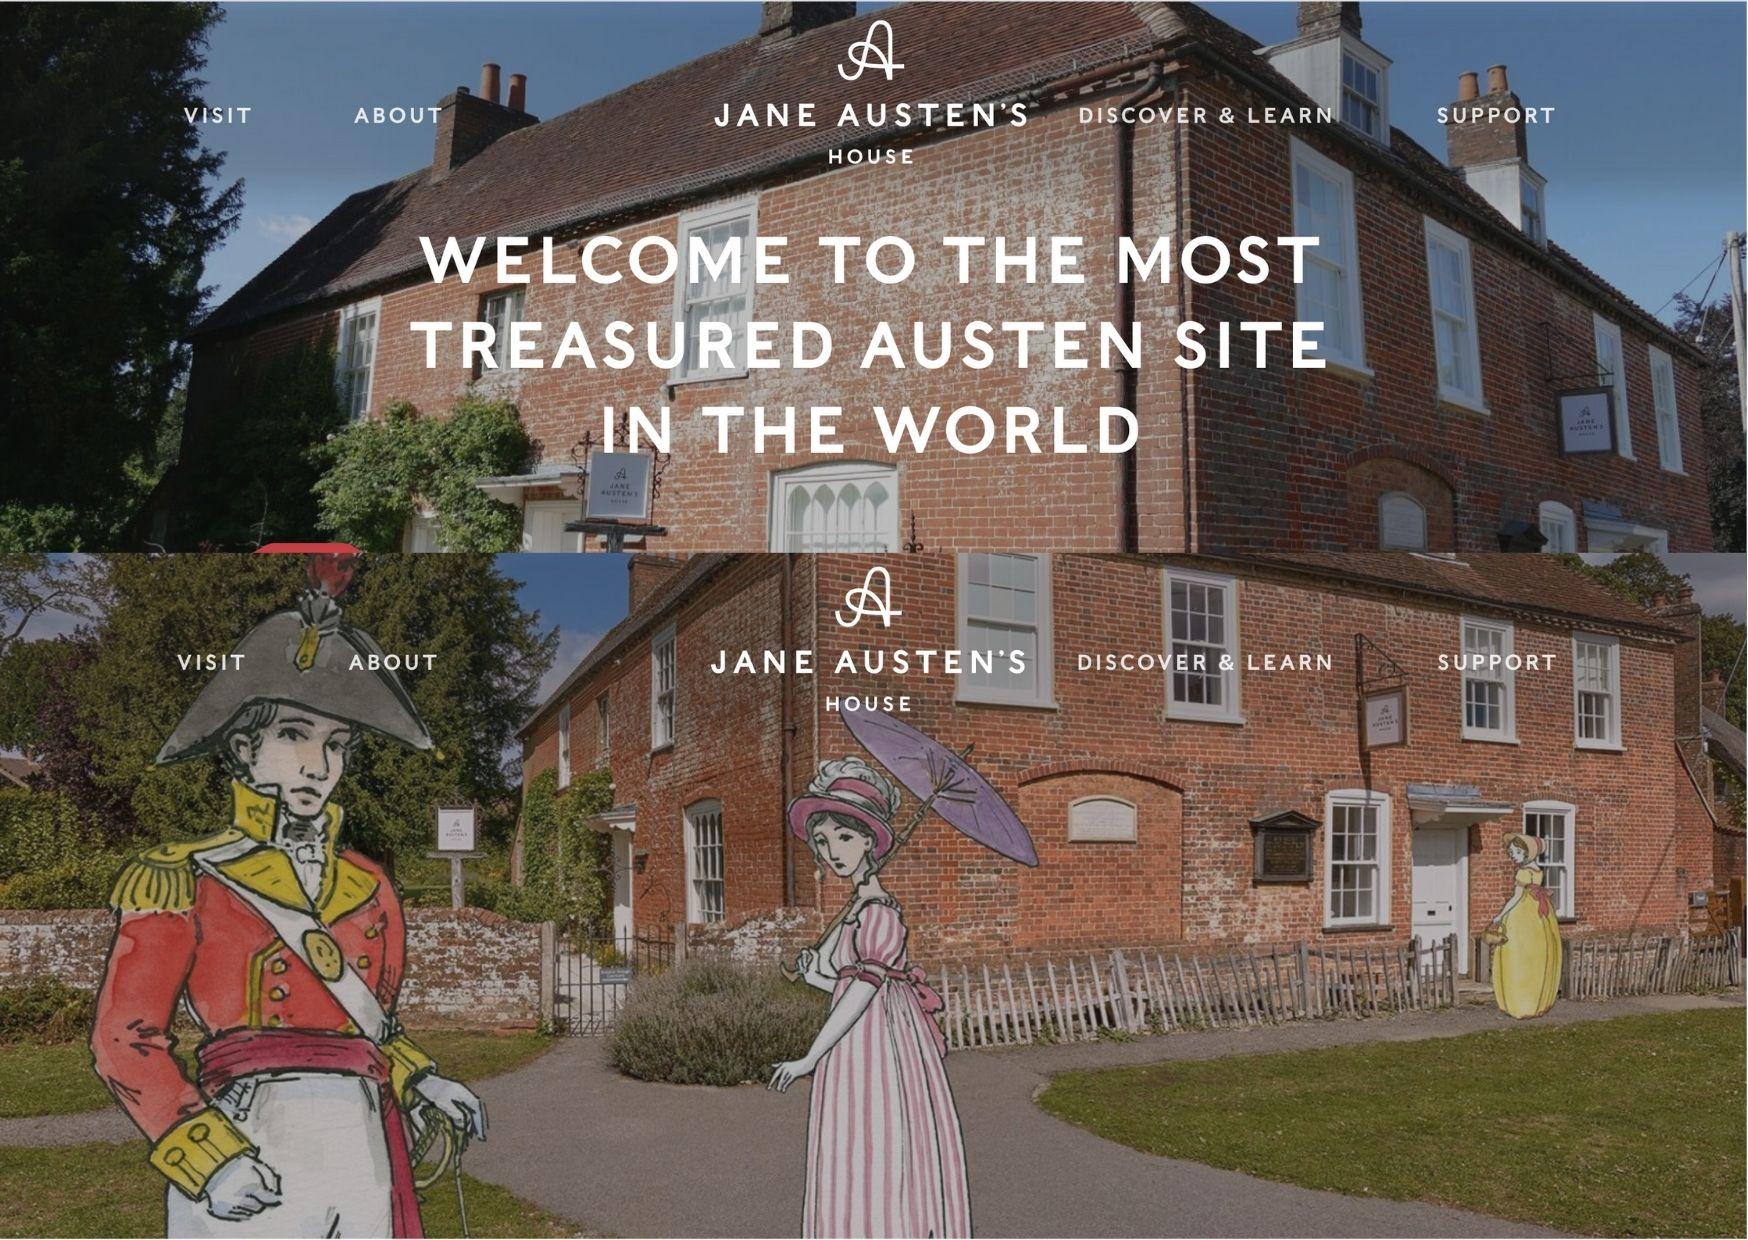 casa de Jane Austen